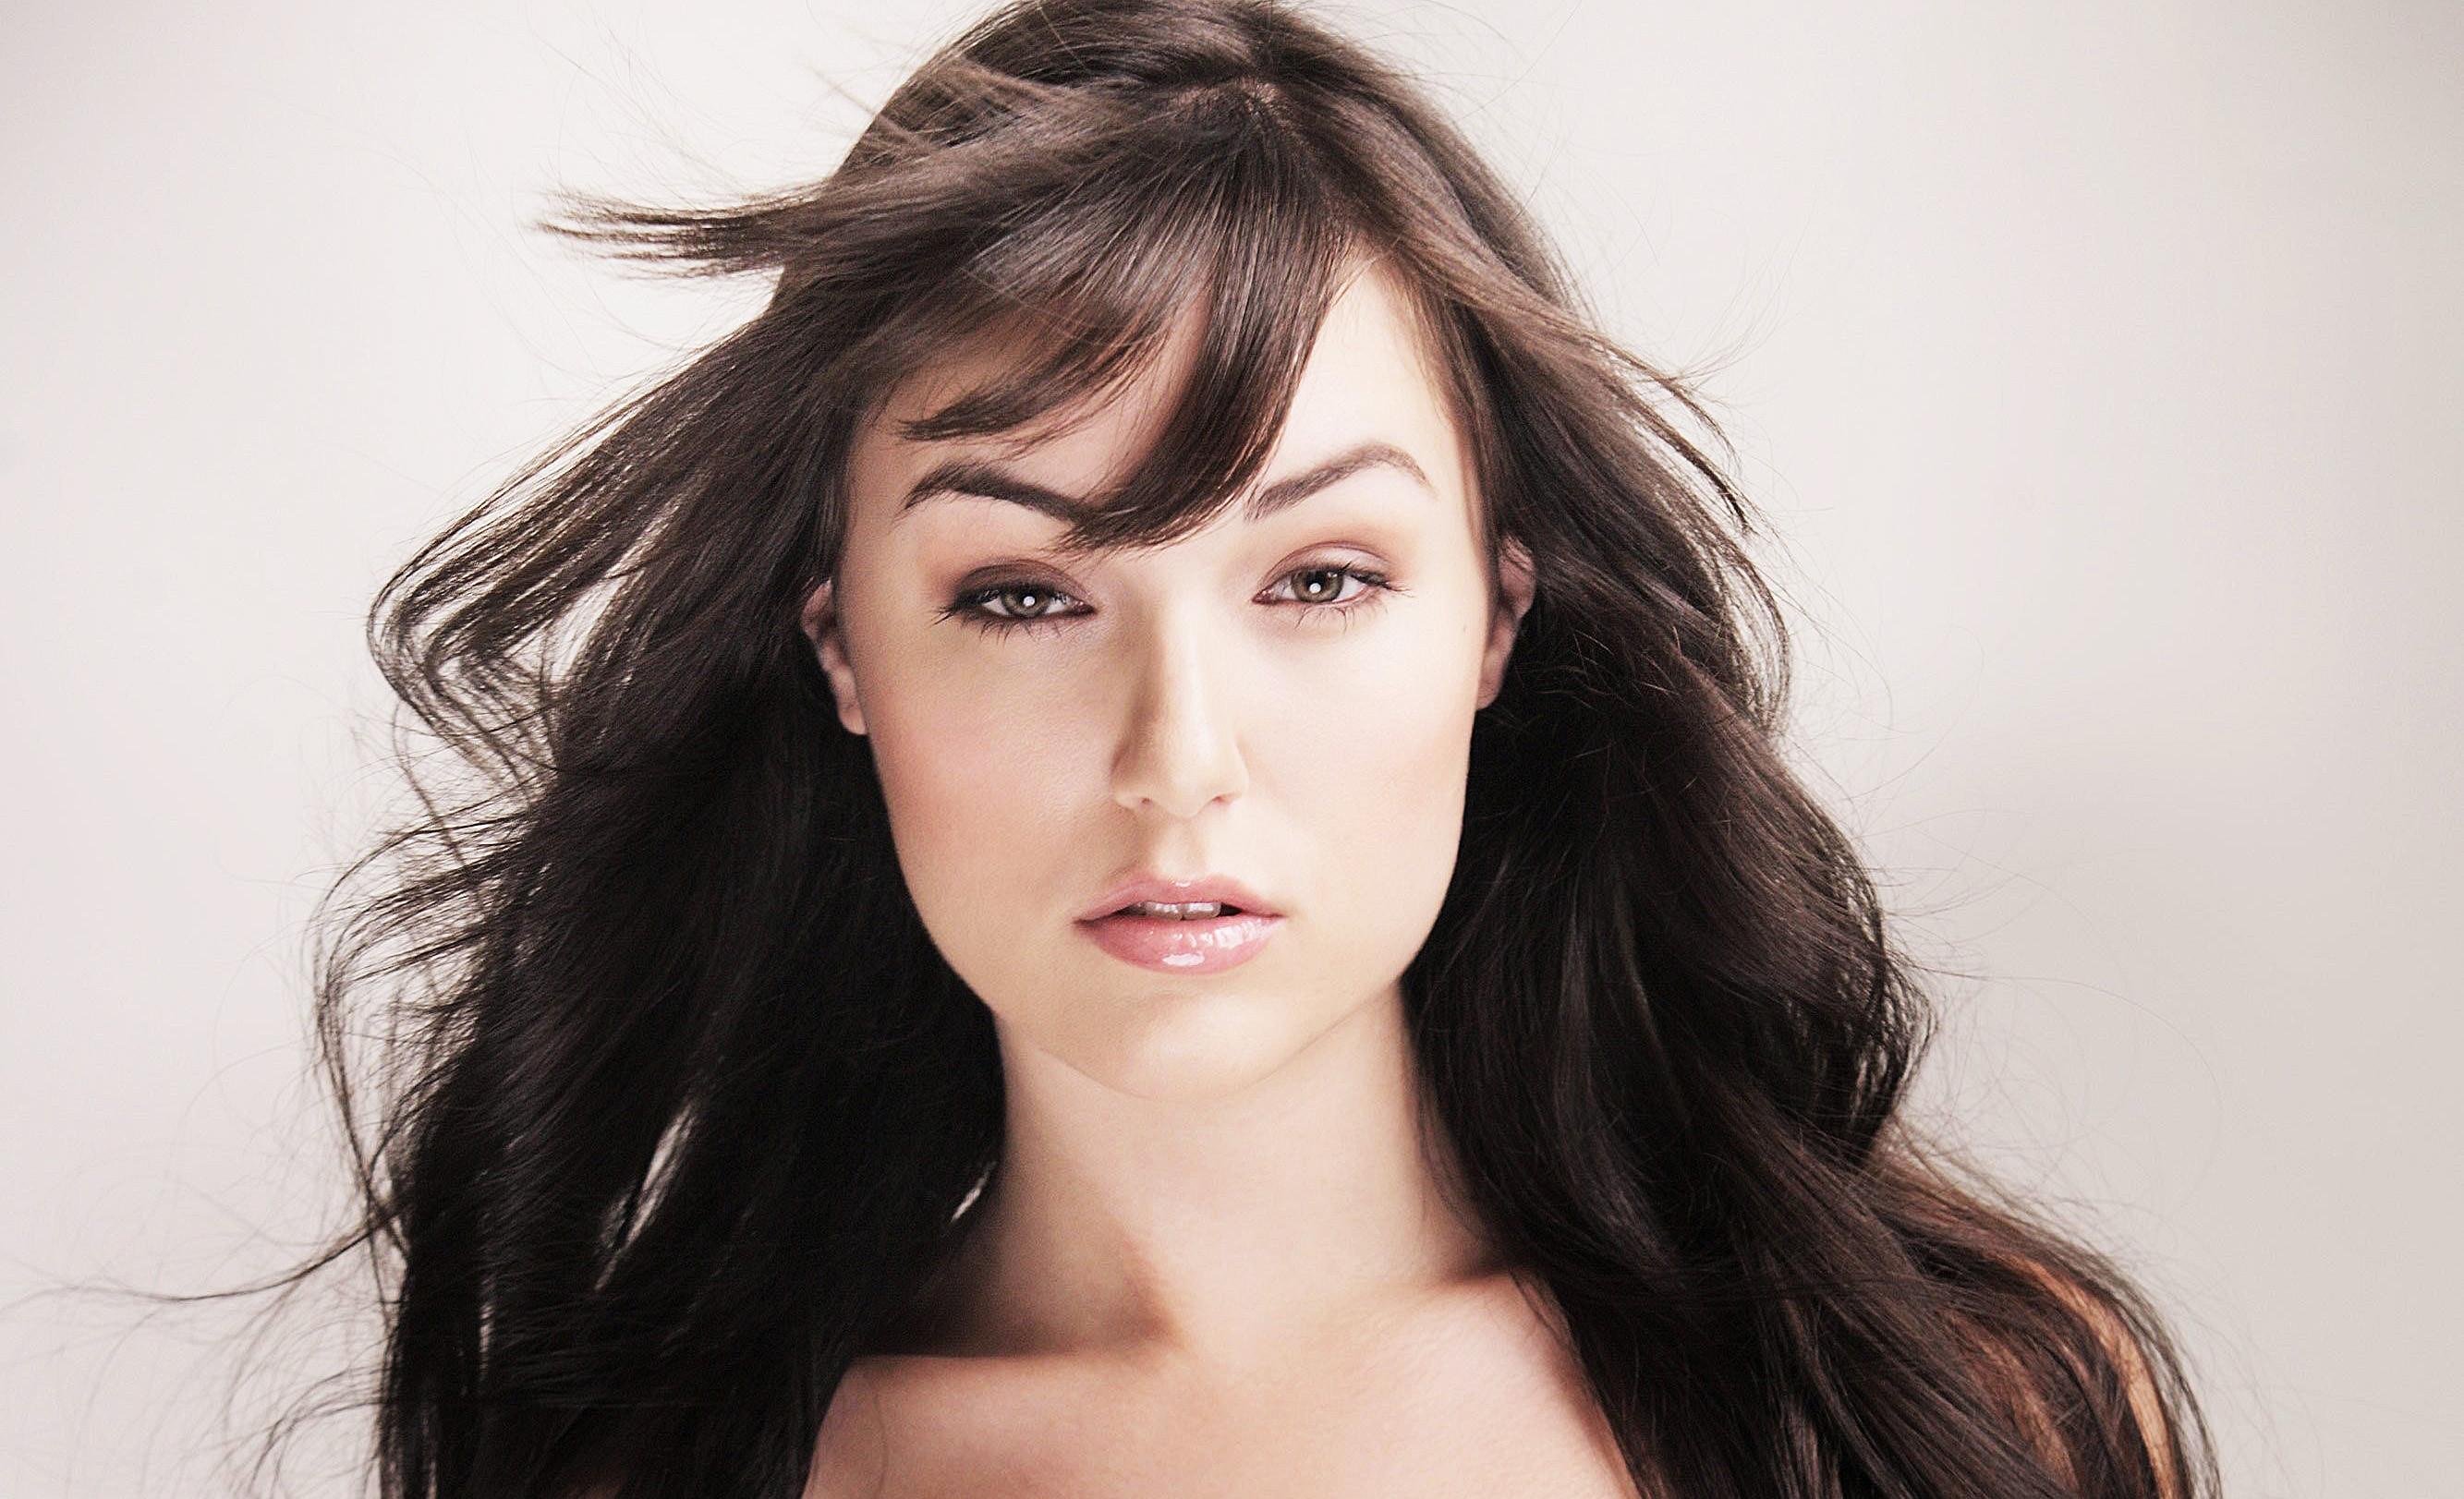 kazanskaya-porno-aktrisa-sandra-krasivie-telki-chastnoe-porno